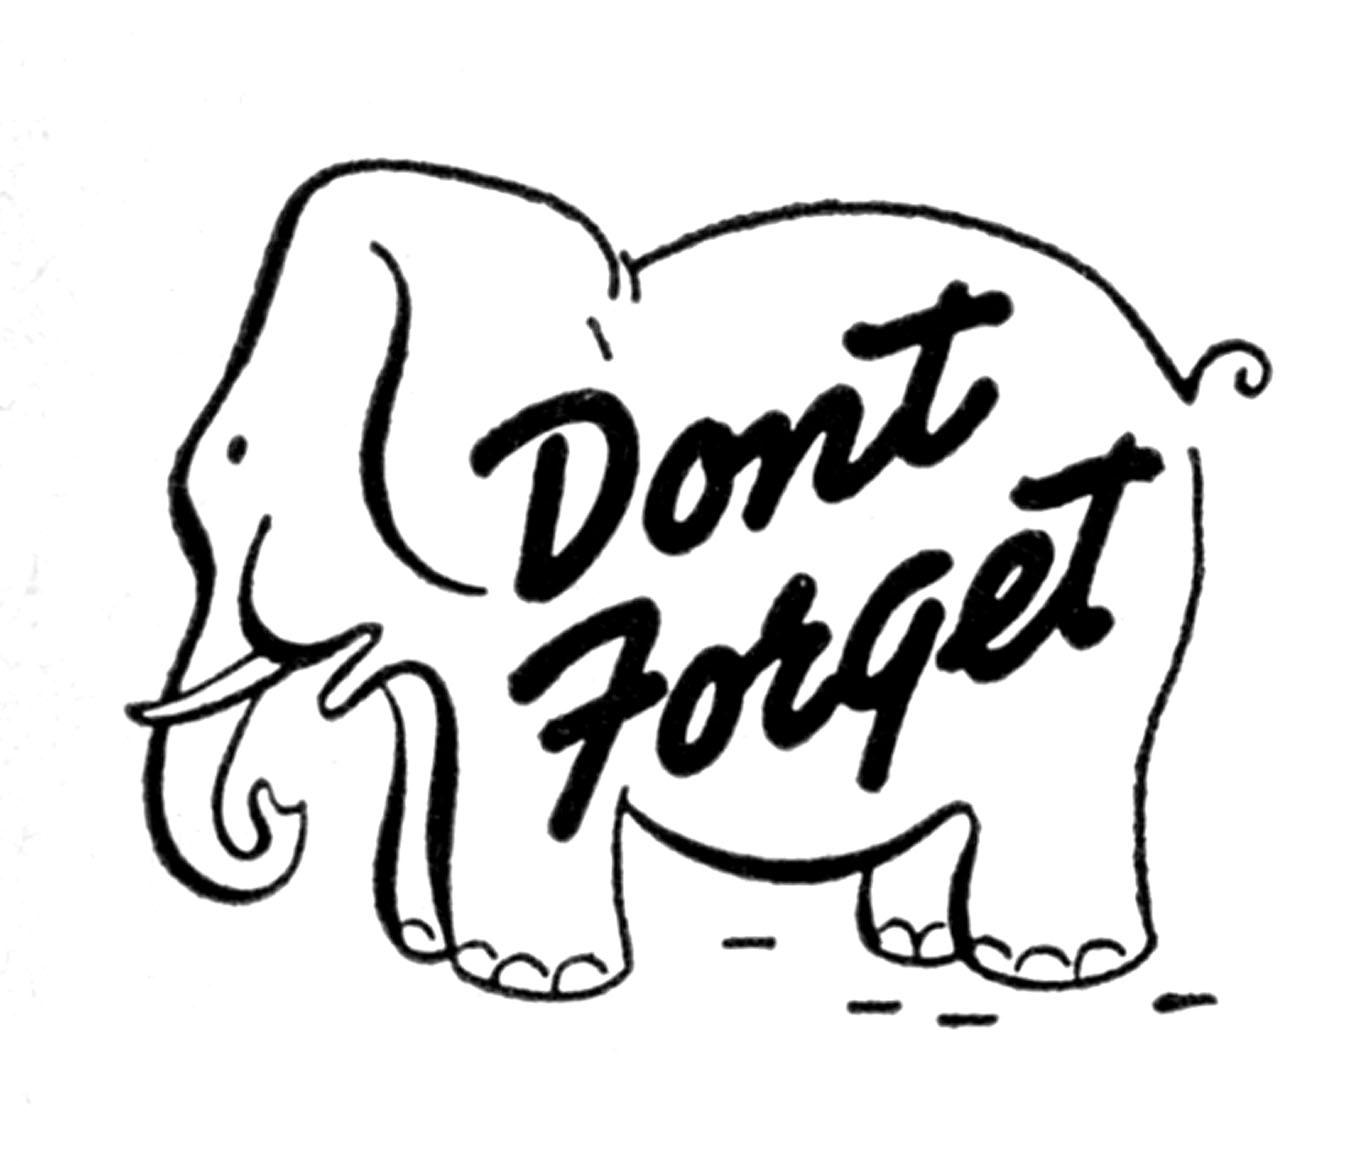 Reminder Clip Art Free Retro Reminder Sy-Reminder Clip Art Free Retro Reminder Symbols Lucketts Online Shop The-10